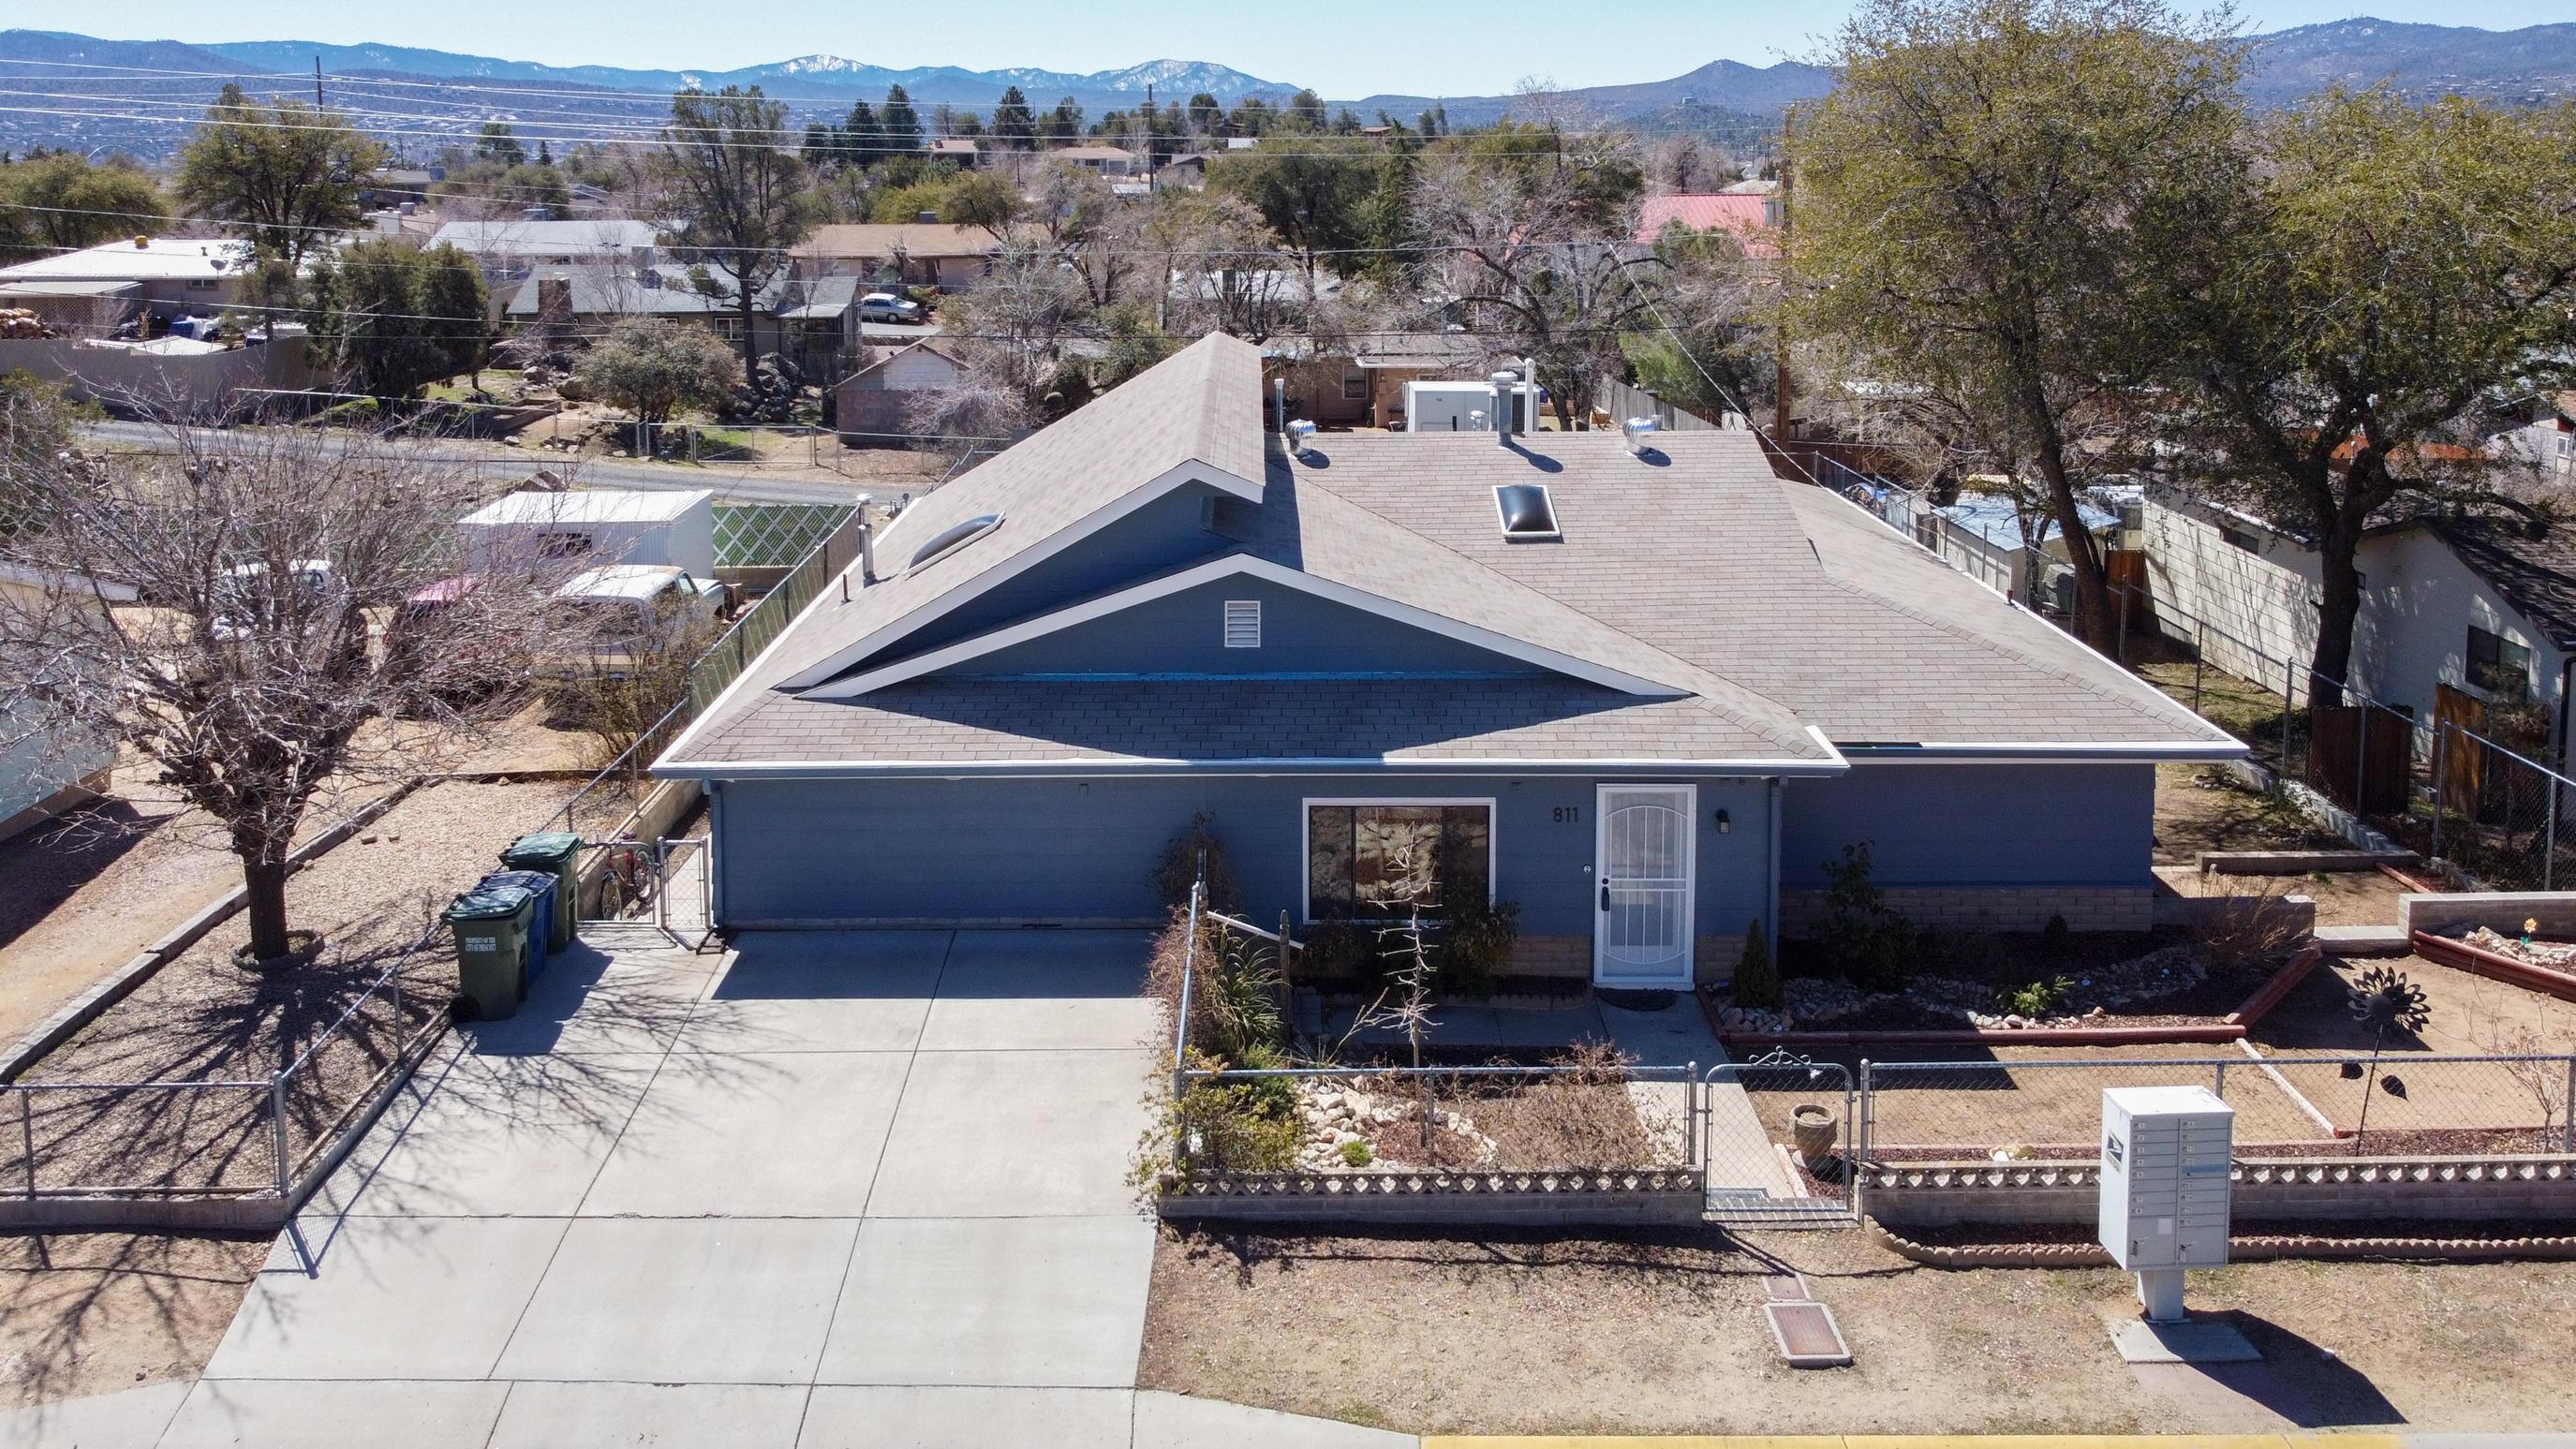 Photo of 811 Rosser, Prescott, AZ 86301